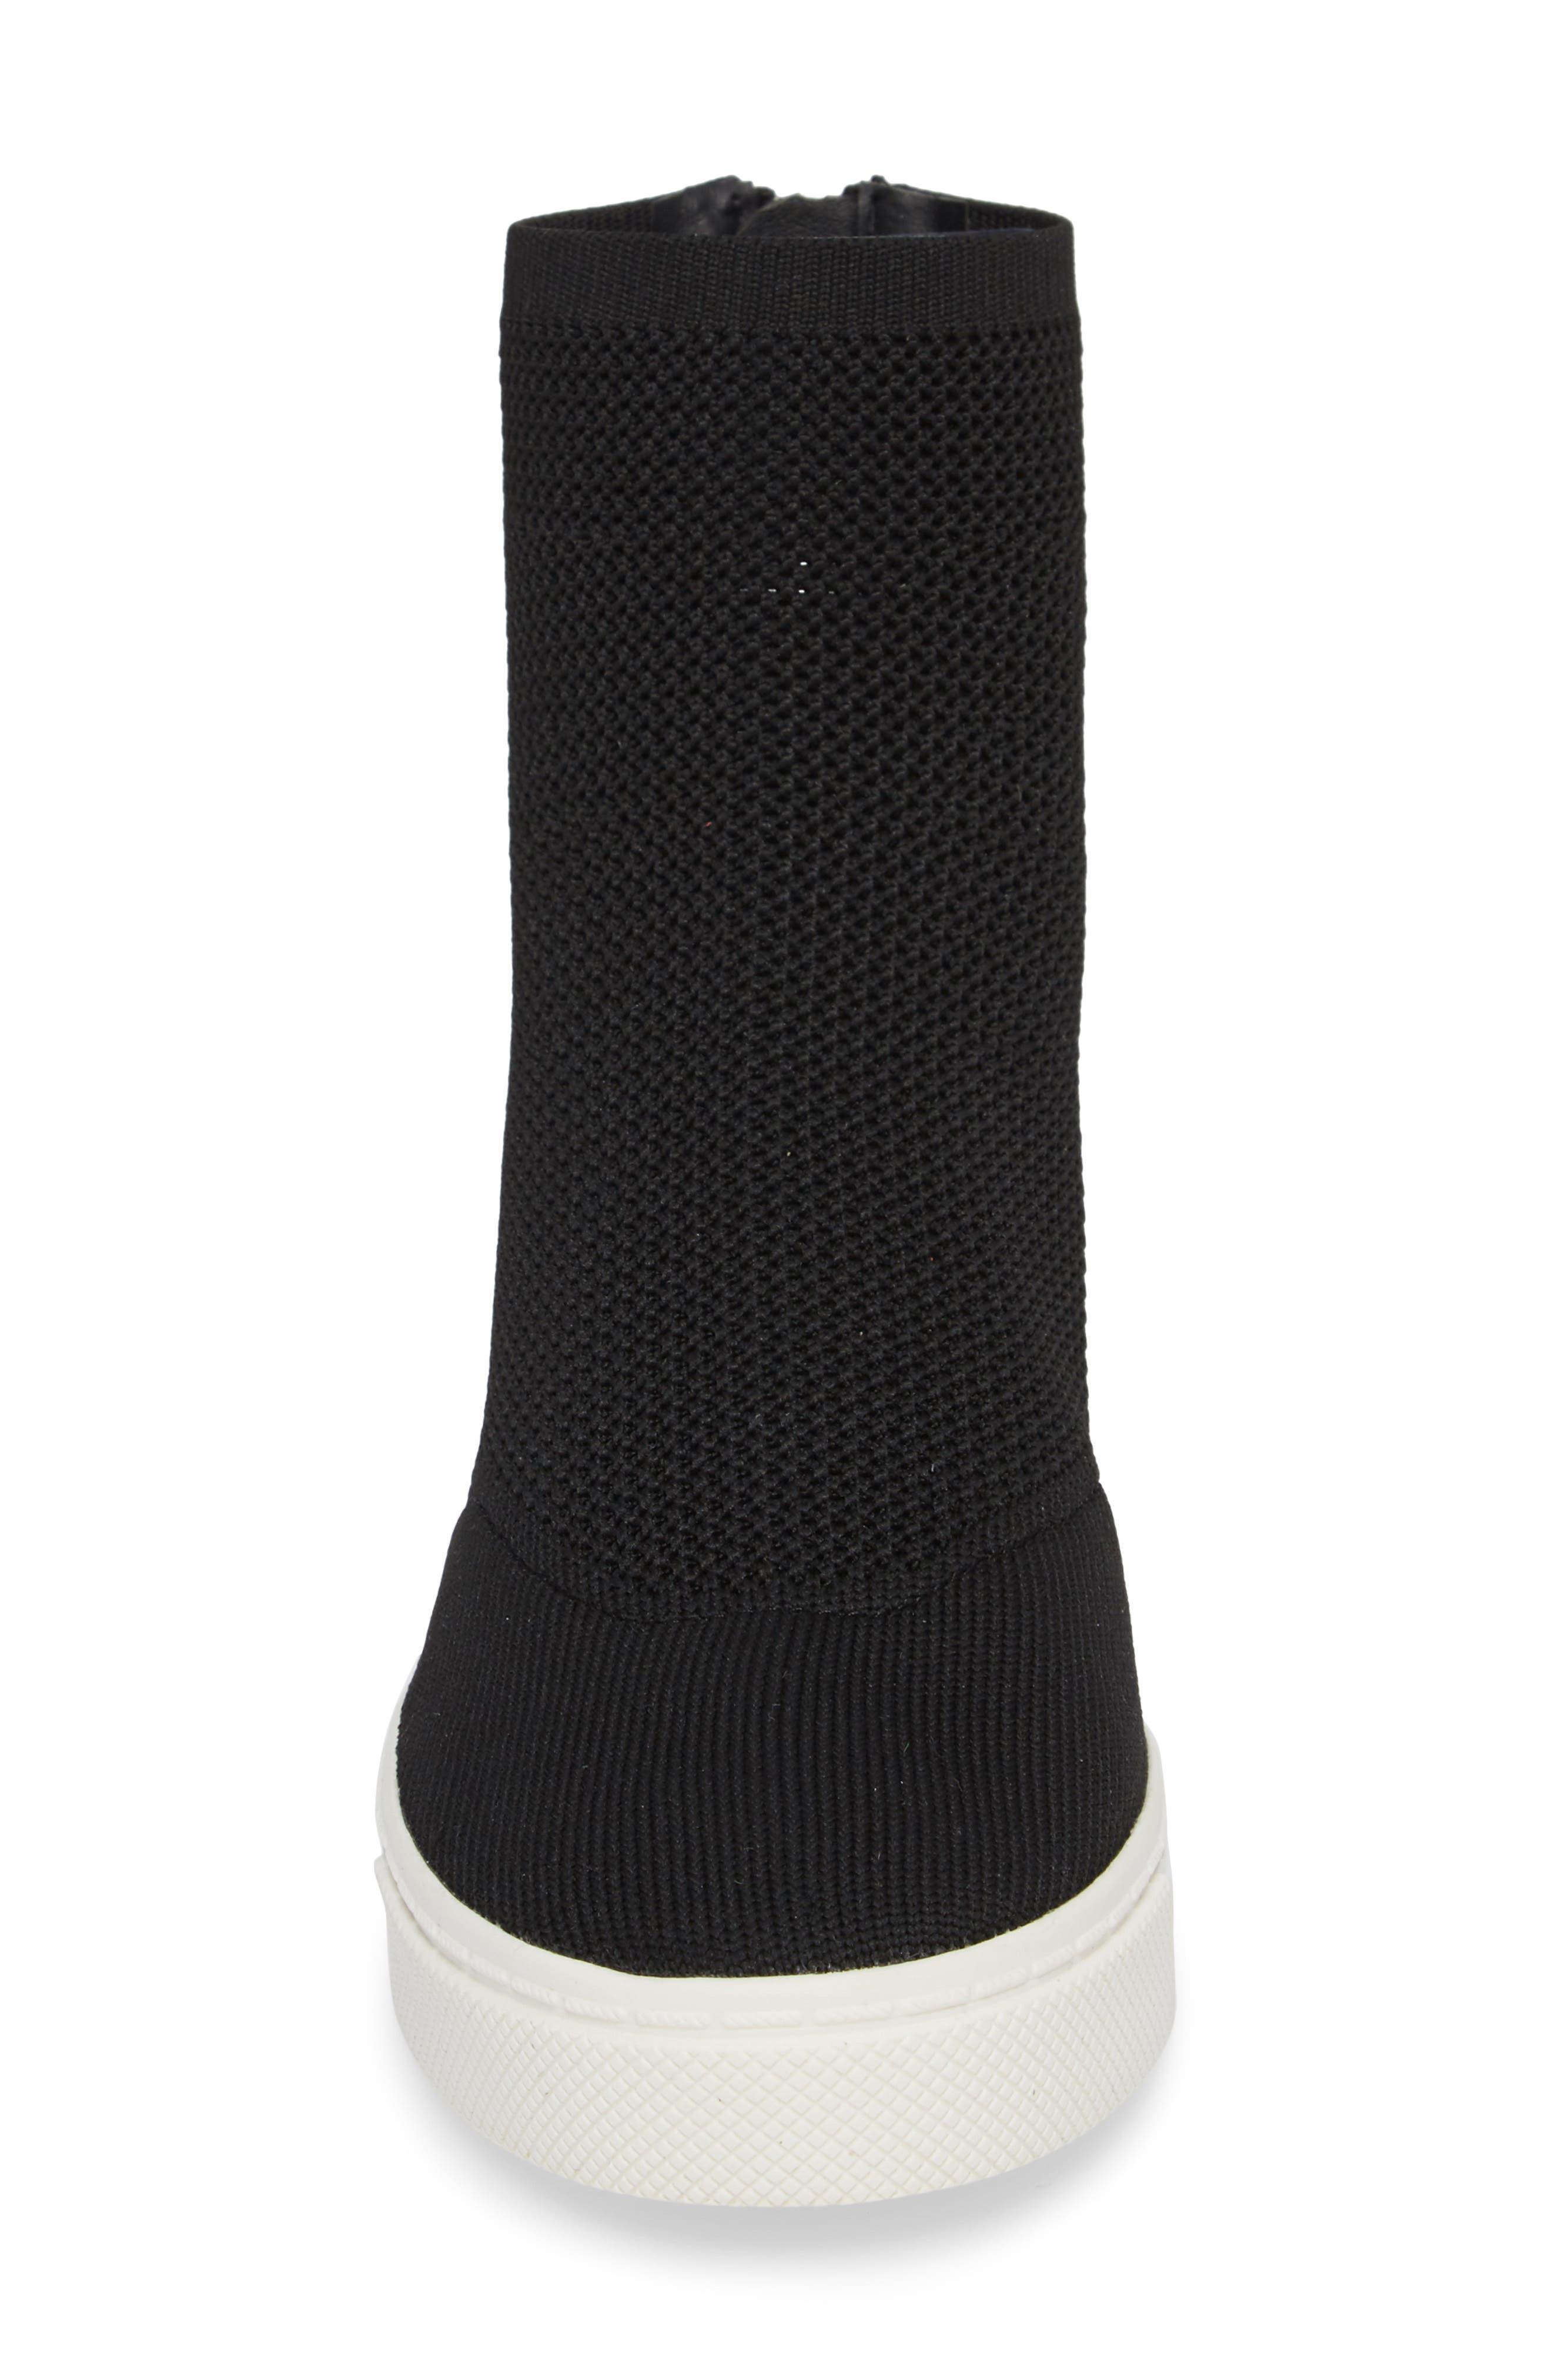 Lizzy Sneaker Bootie,                             Alternate thumbnail 4, color,                             Black